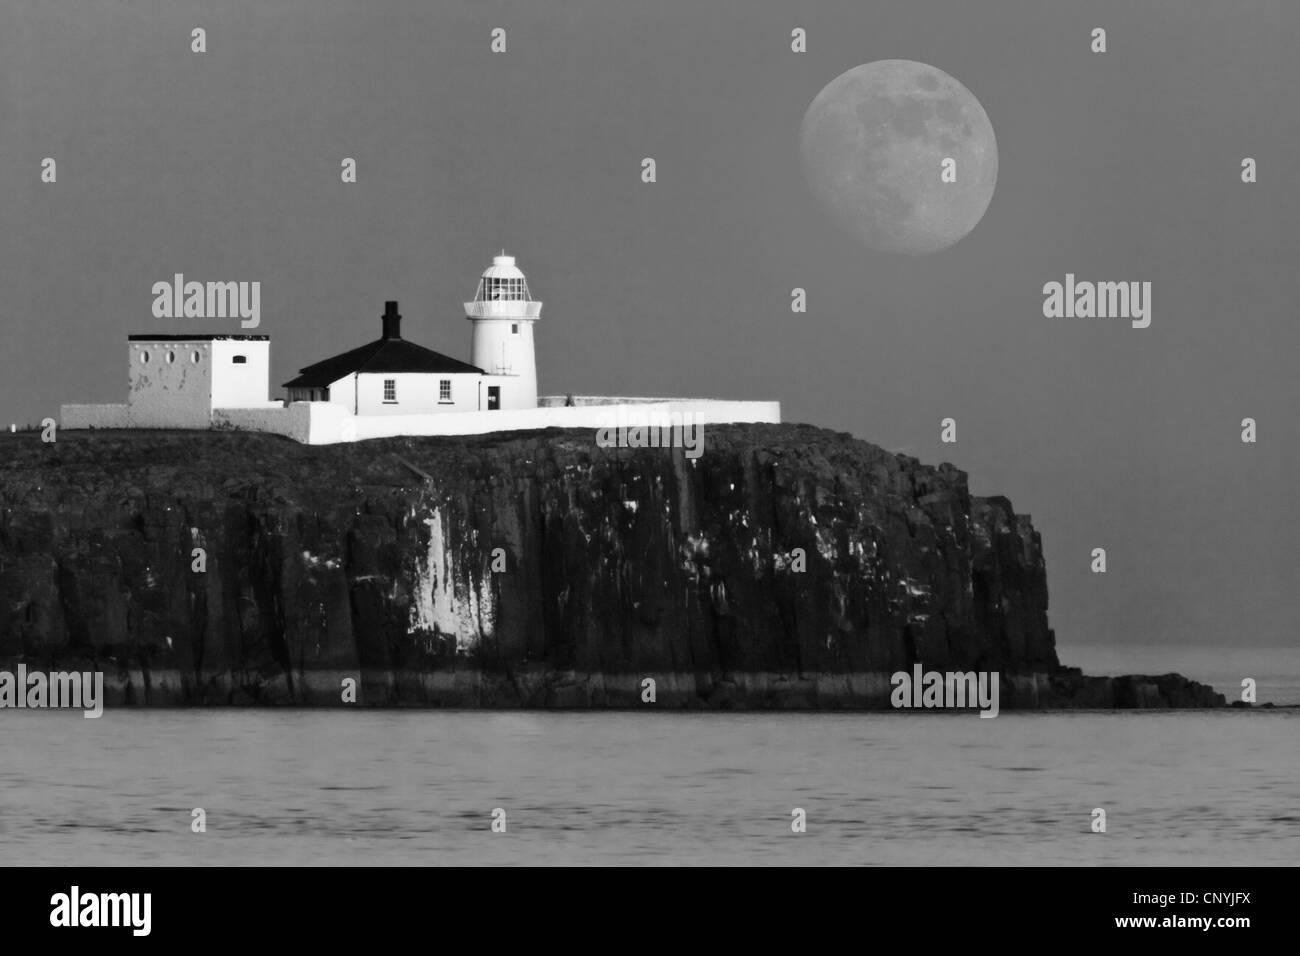 Inner Farne Lighthouse, Farne Islands, Northumberland, England, UK - Stock Image